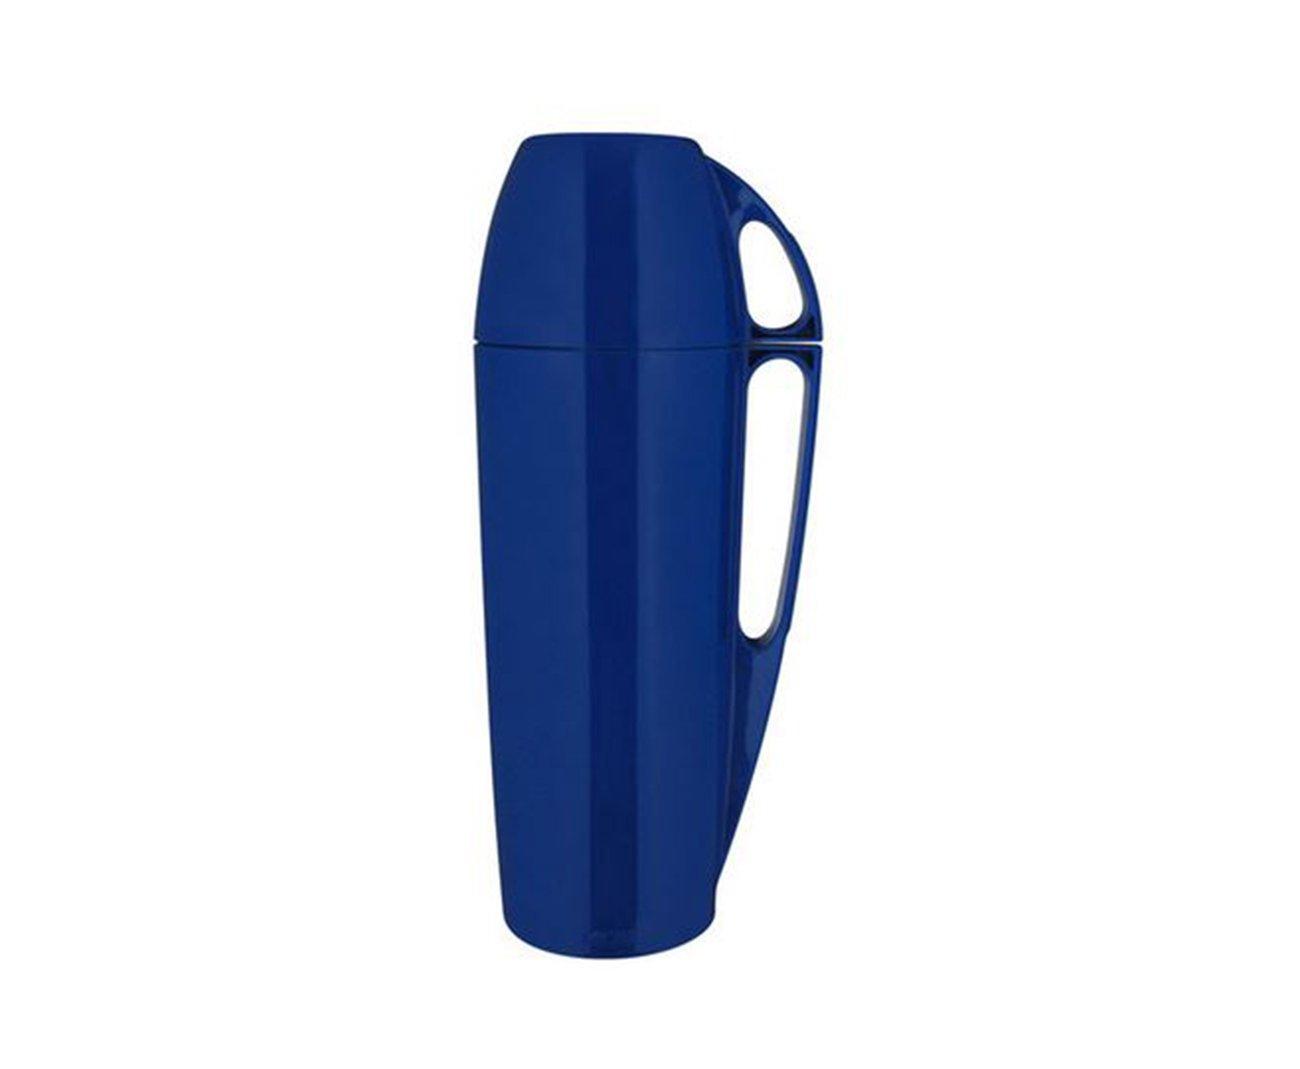 Garrafa Térmica Eleganza 1,0 Litro Azul Ref. 25100701 - Mor